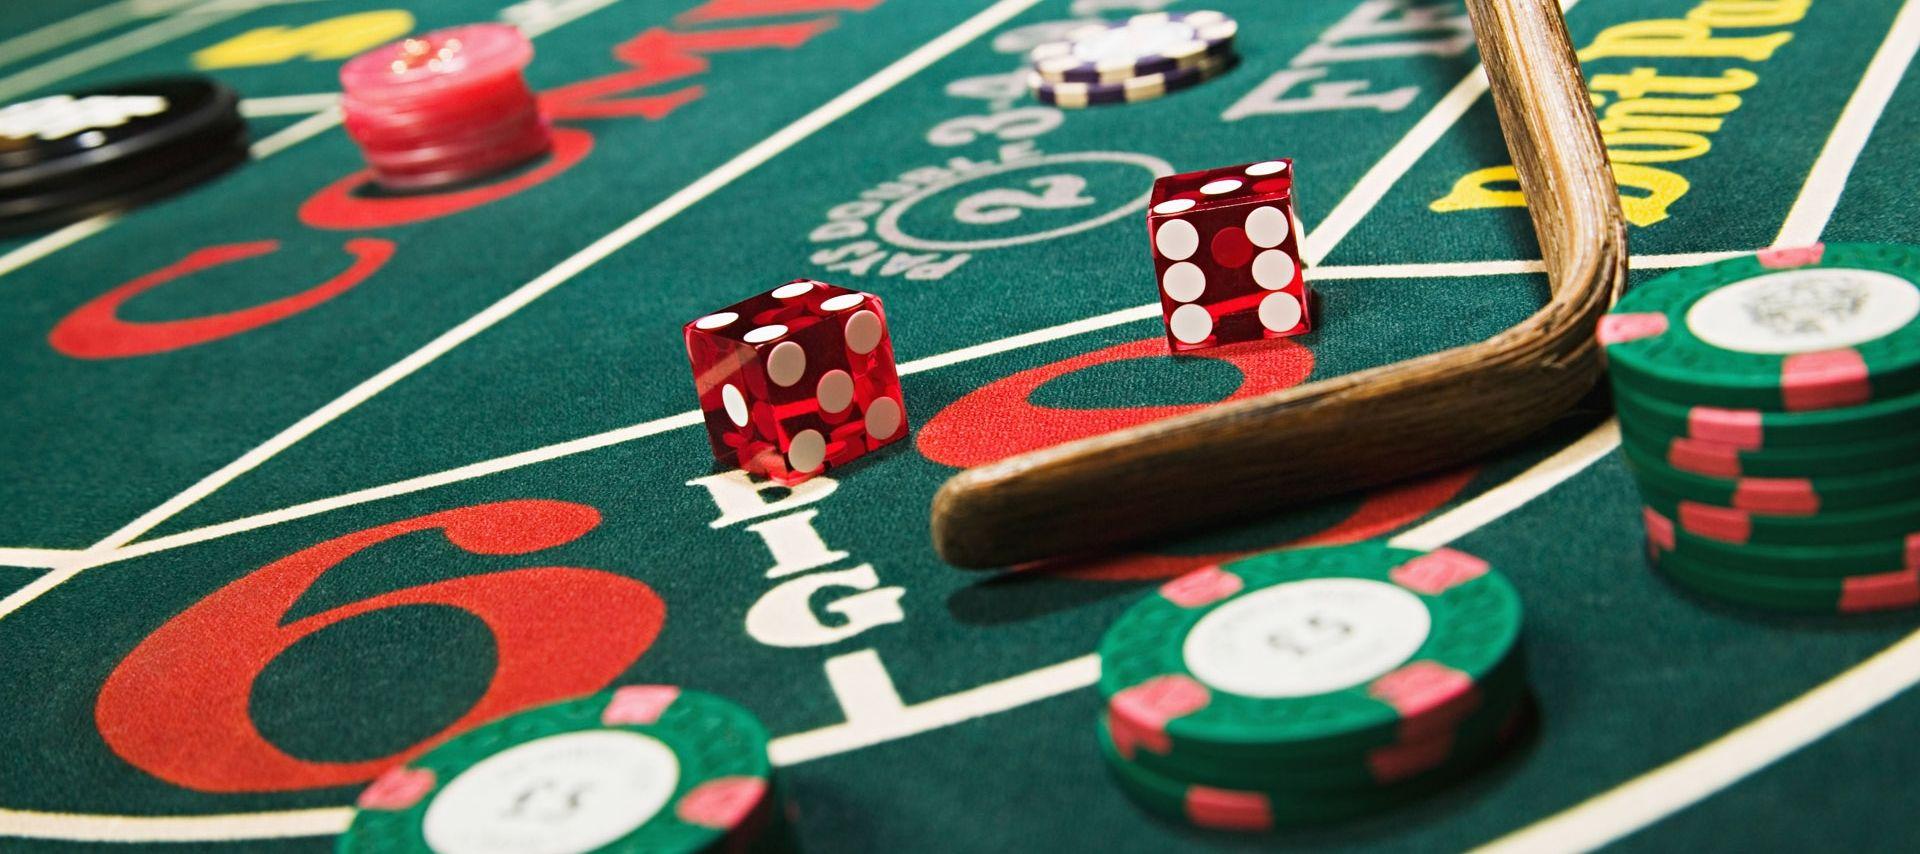 Casino poker web site famous slot machine in vegas